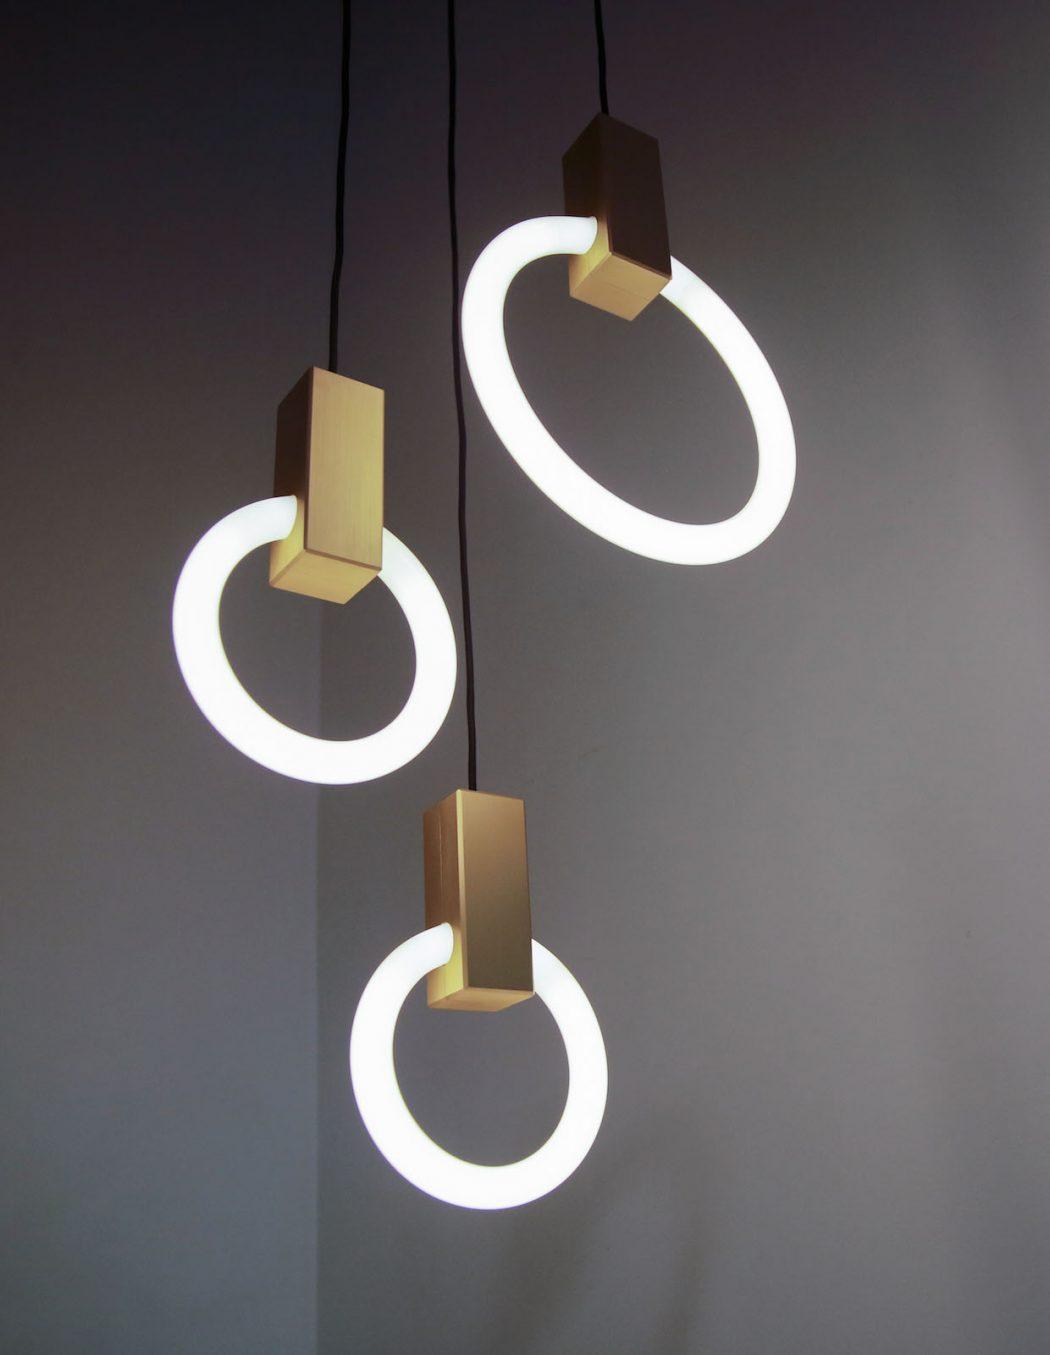 Halo-Lamp-8.jpeg